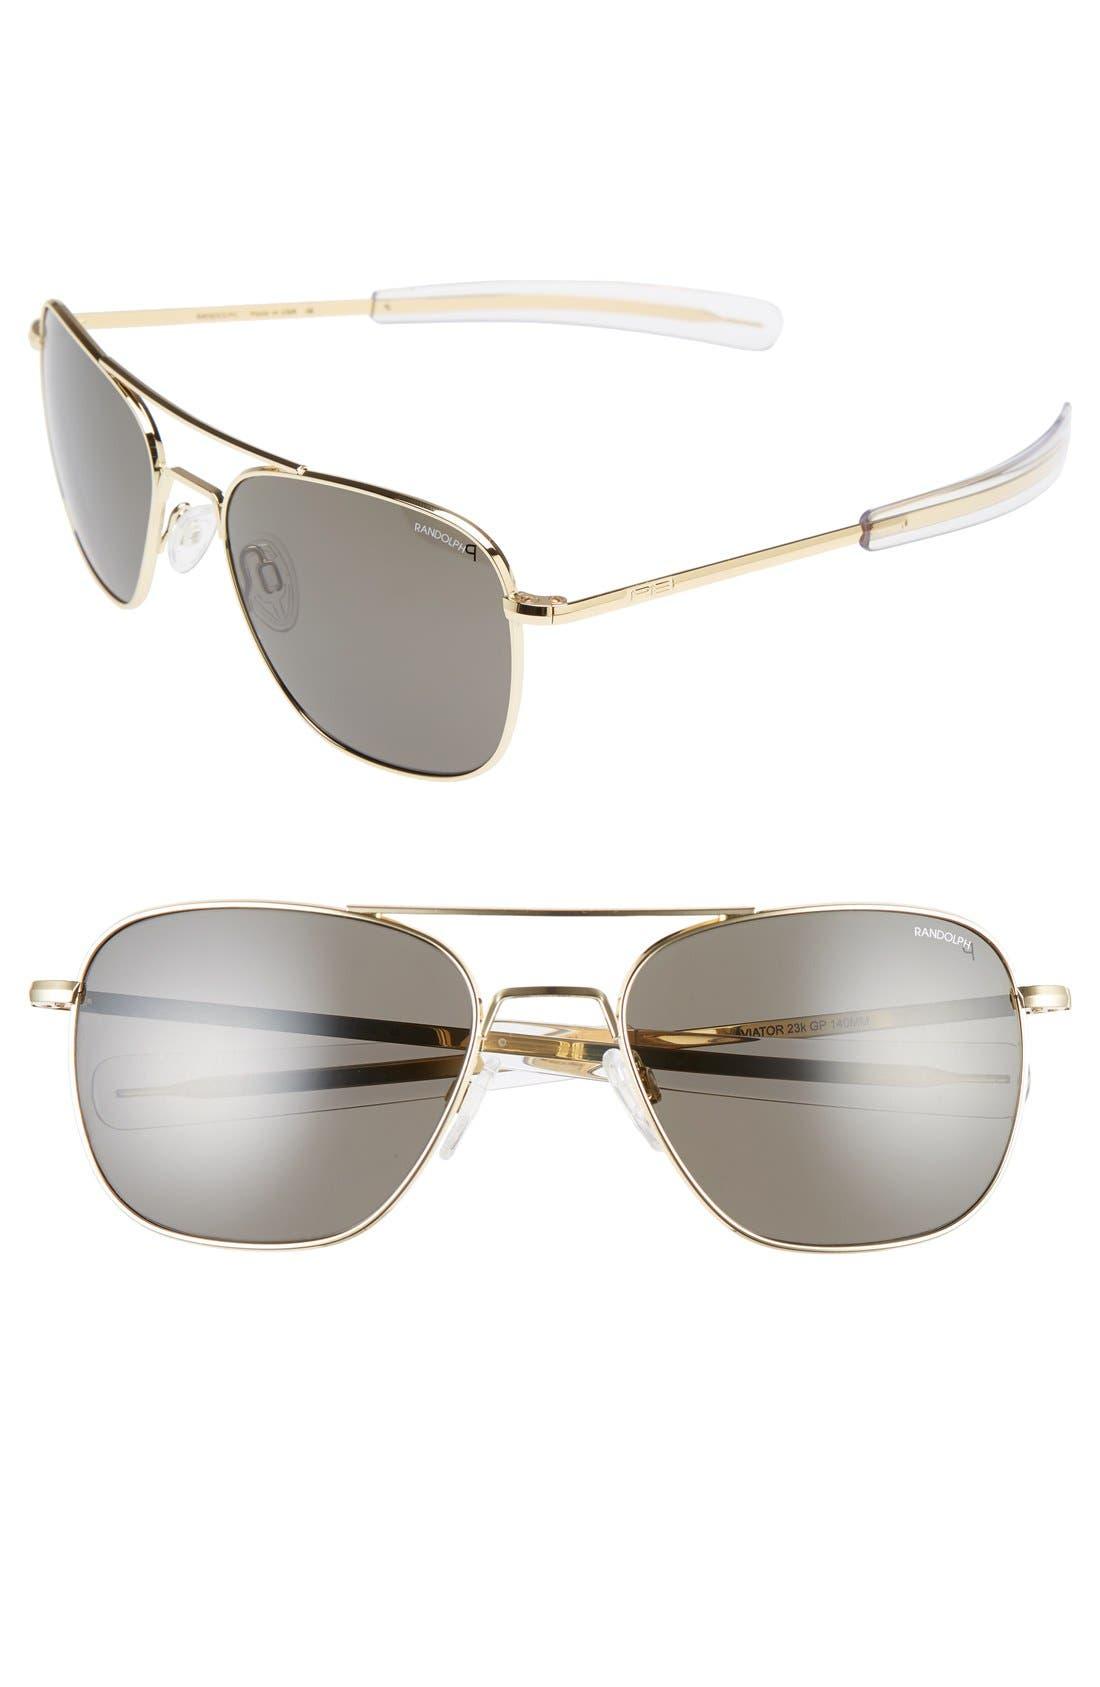 58mm Polarized Aviator Sunglasses,                             Main thumbnail 1, color,                             711